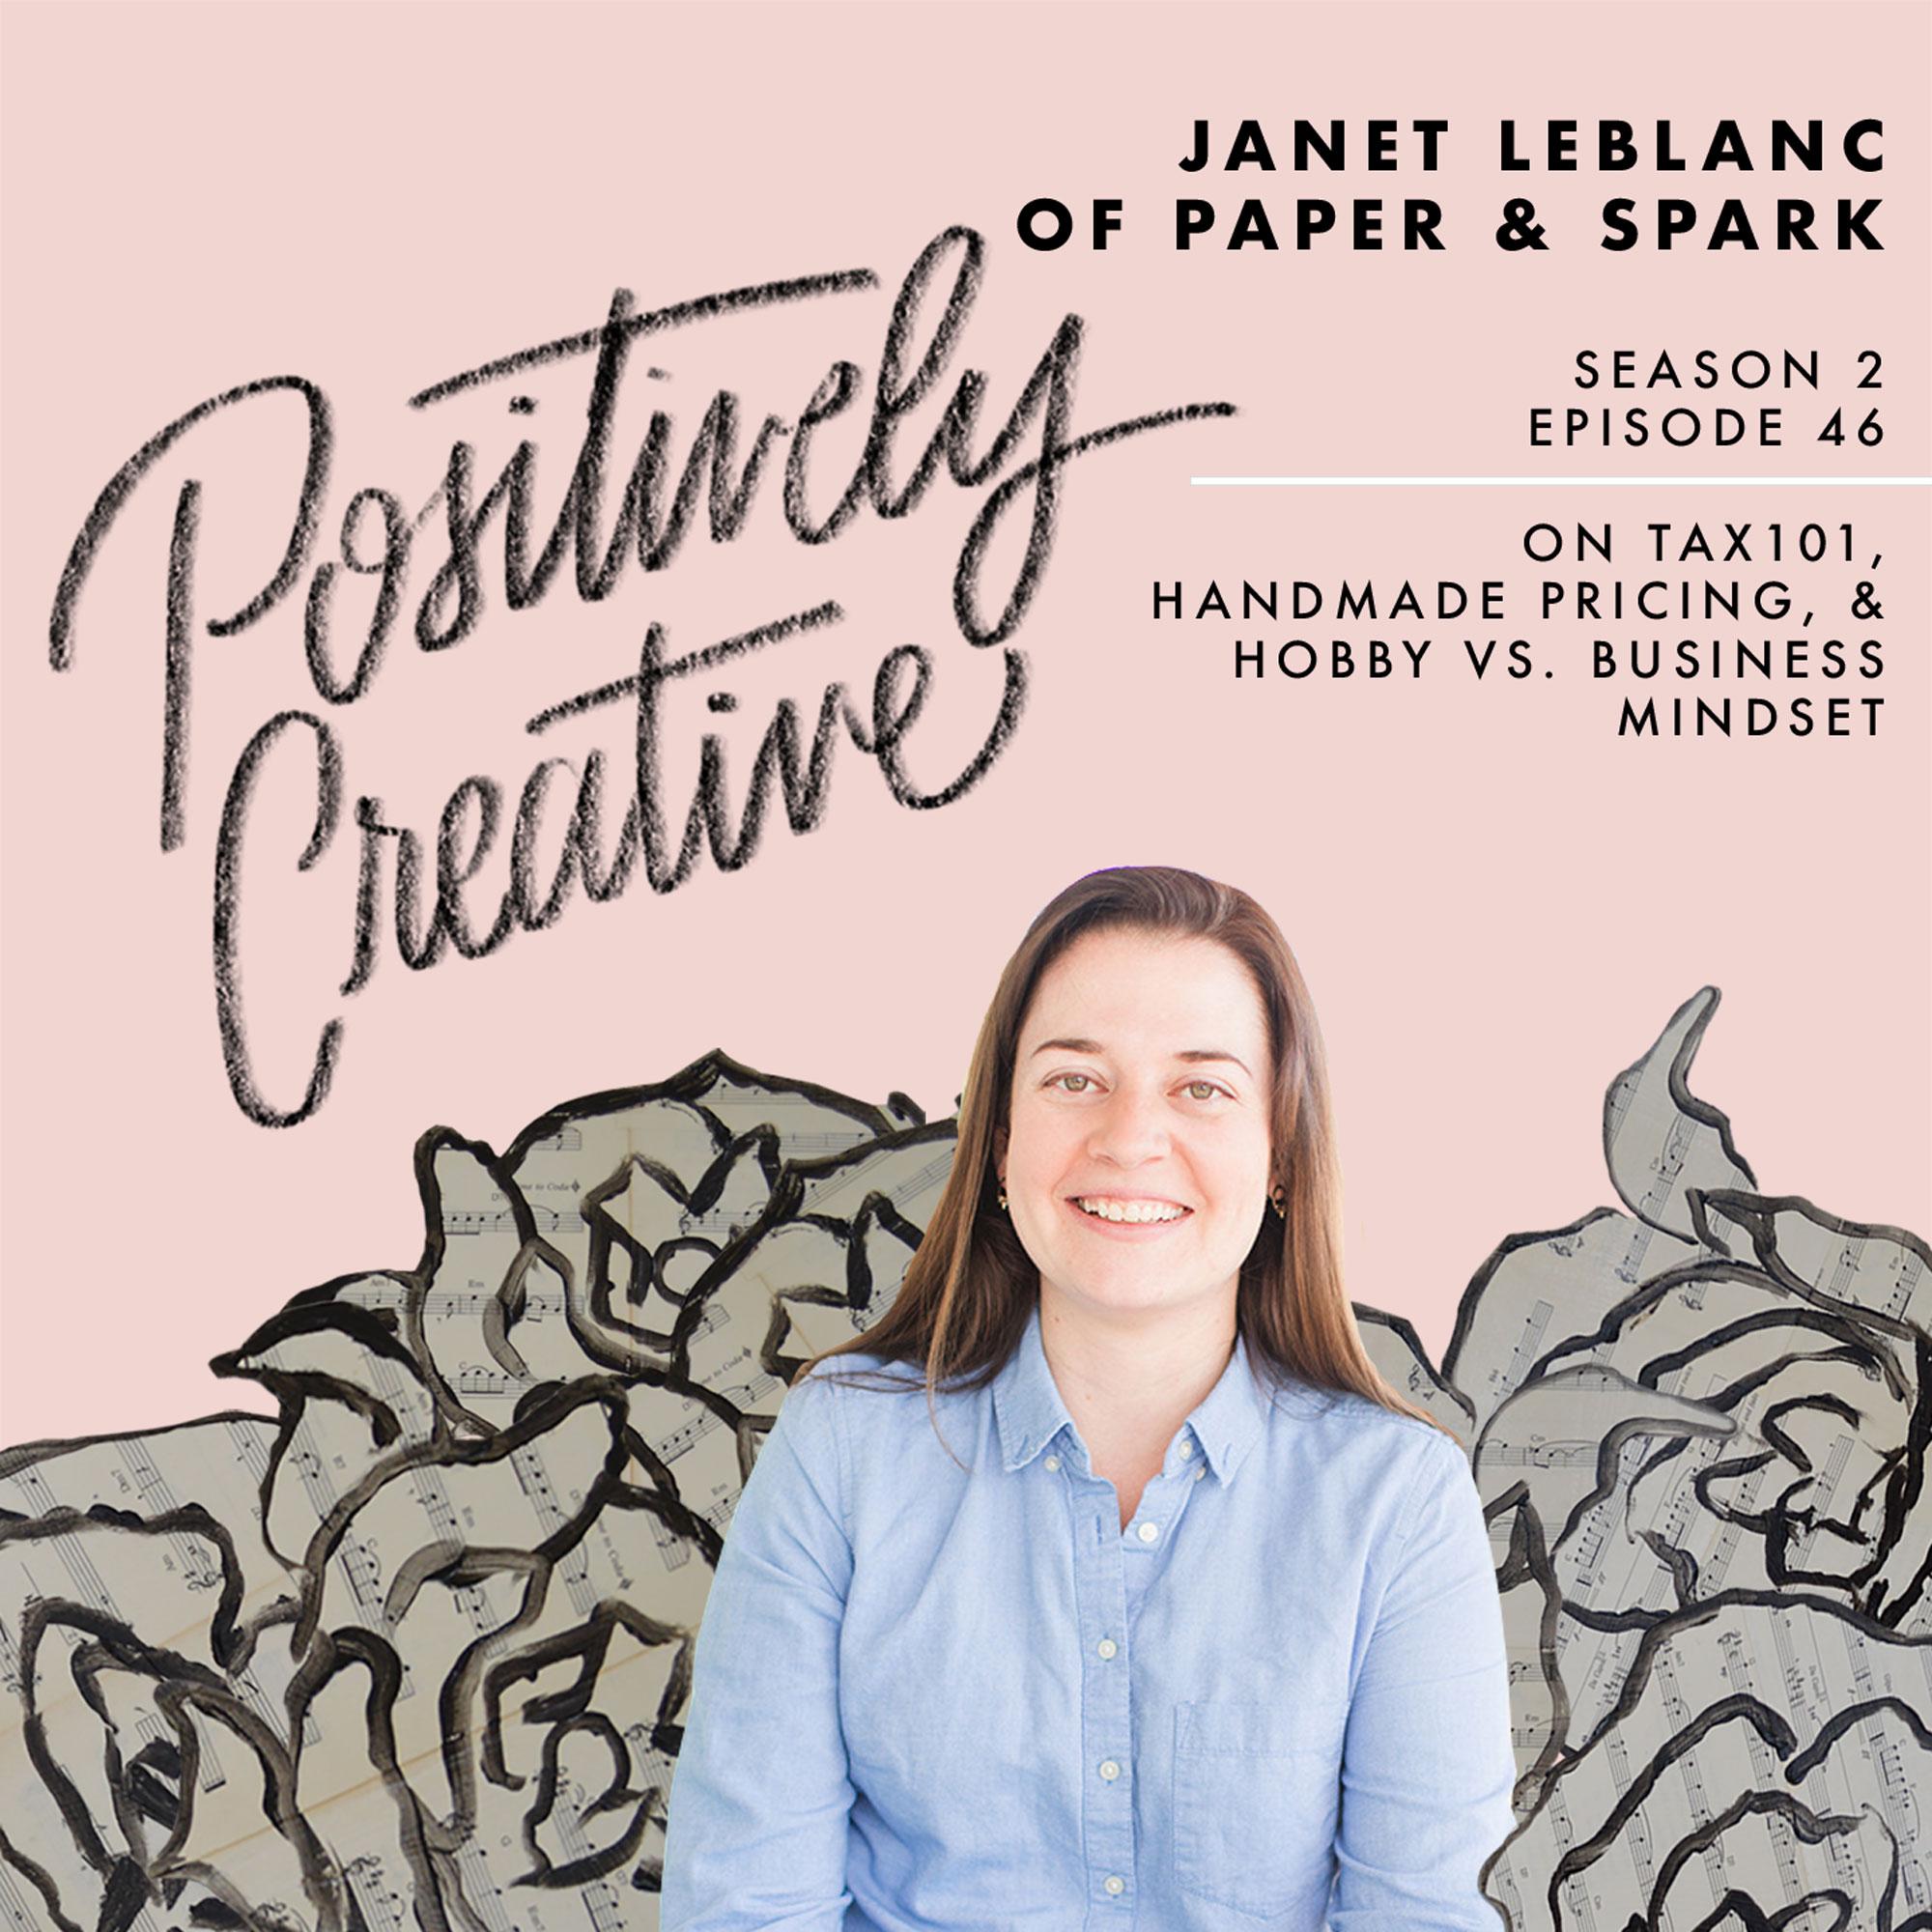 S2-Ep-46---Janet-LeBlanc-of-Paper-&-Spark-on-Tax101,-Handmade-Pricing,-&-Hobby-vs.-Business-Mindset.jpg